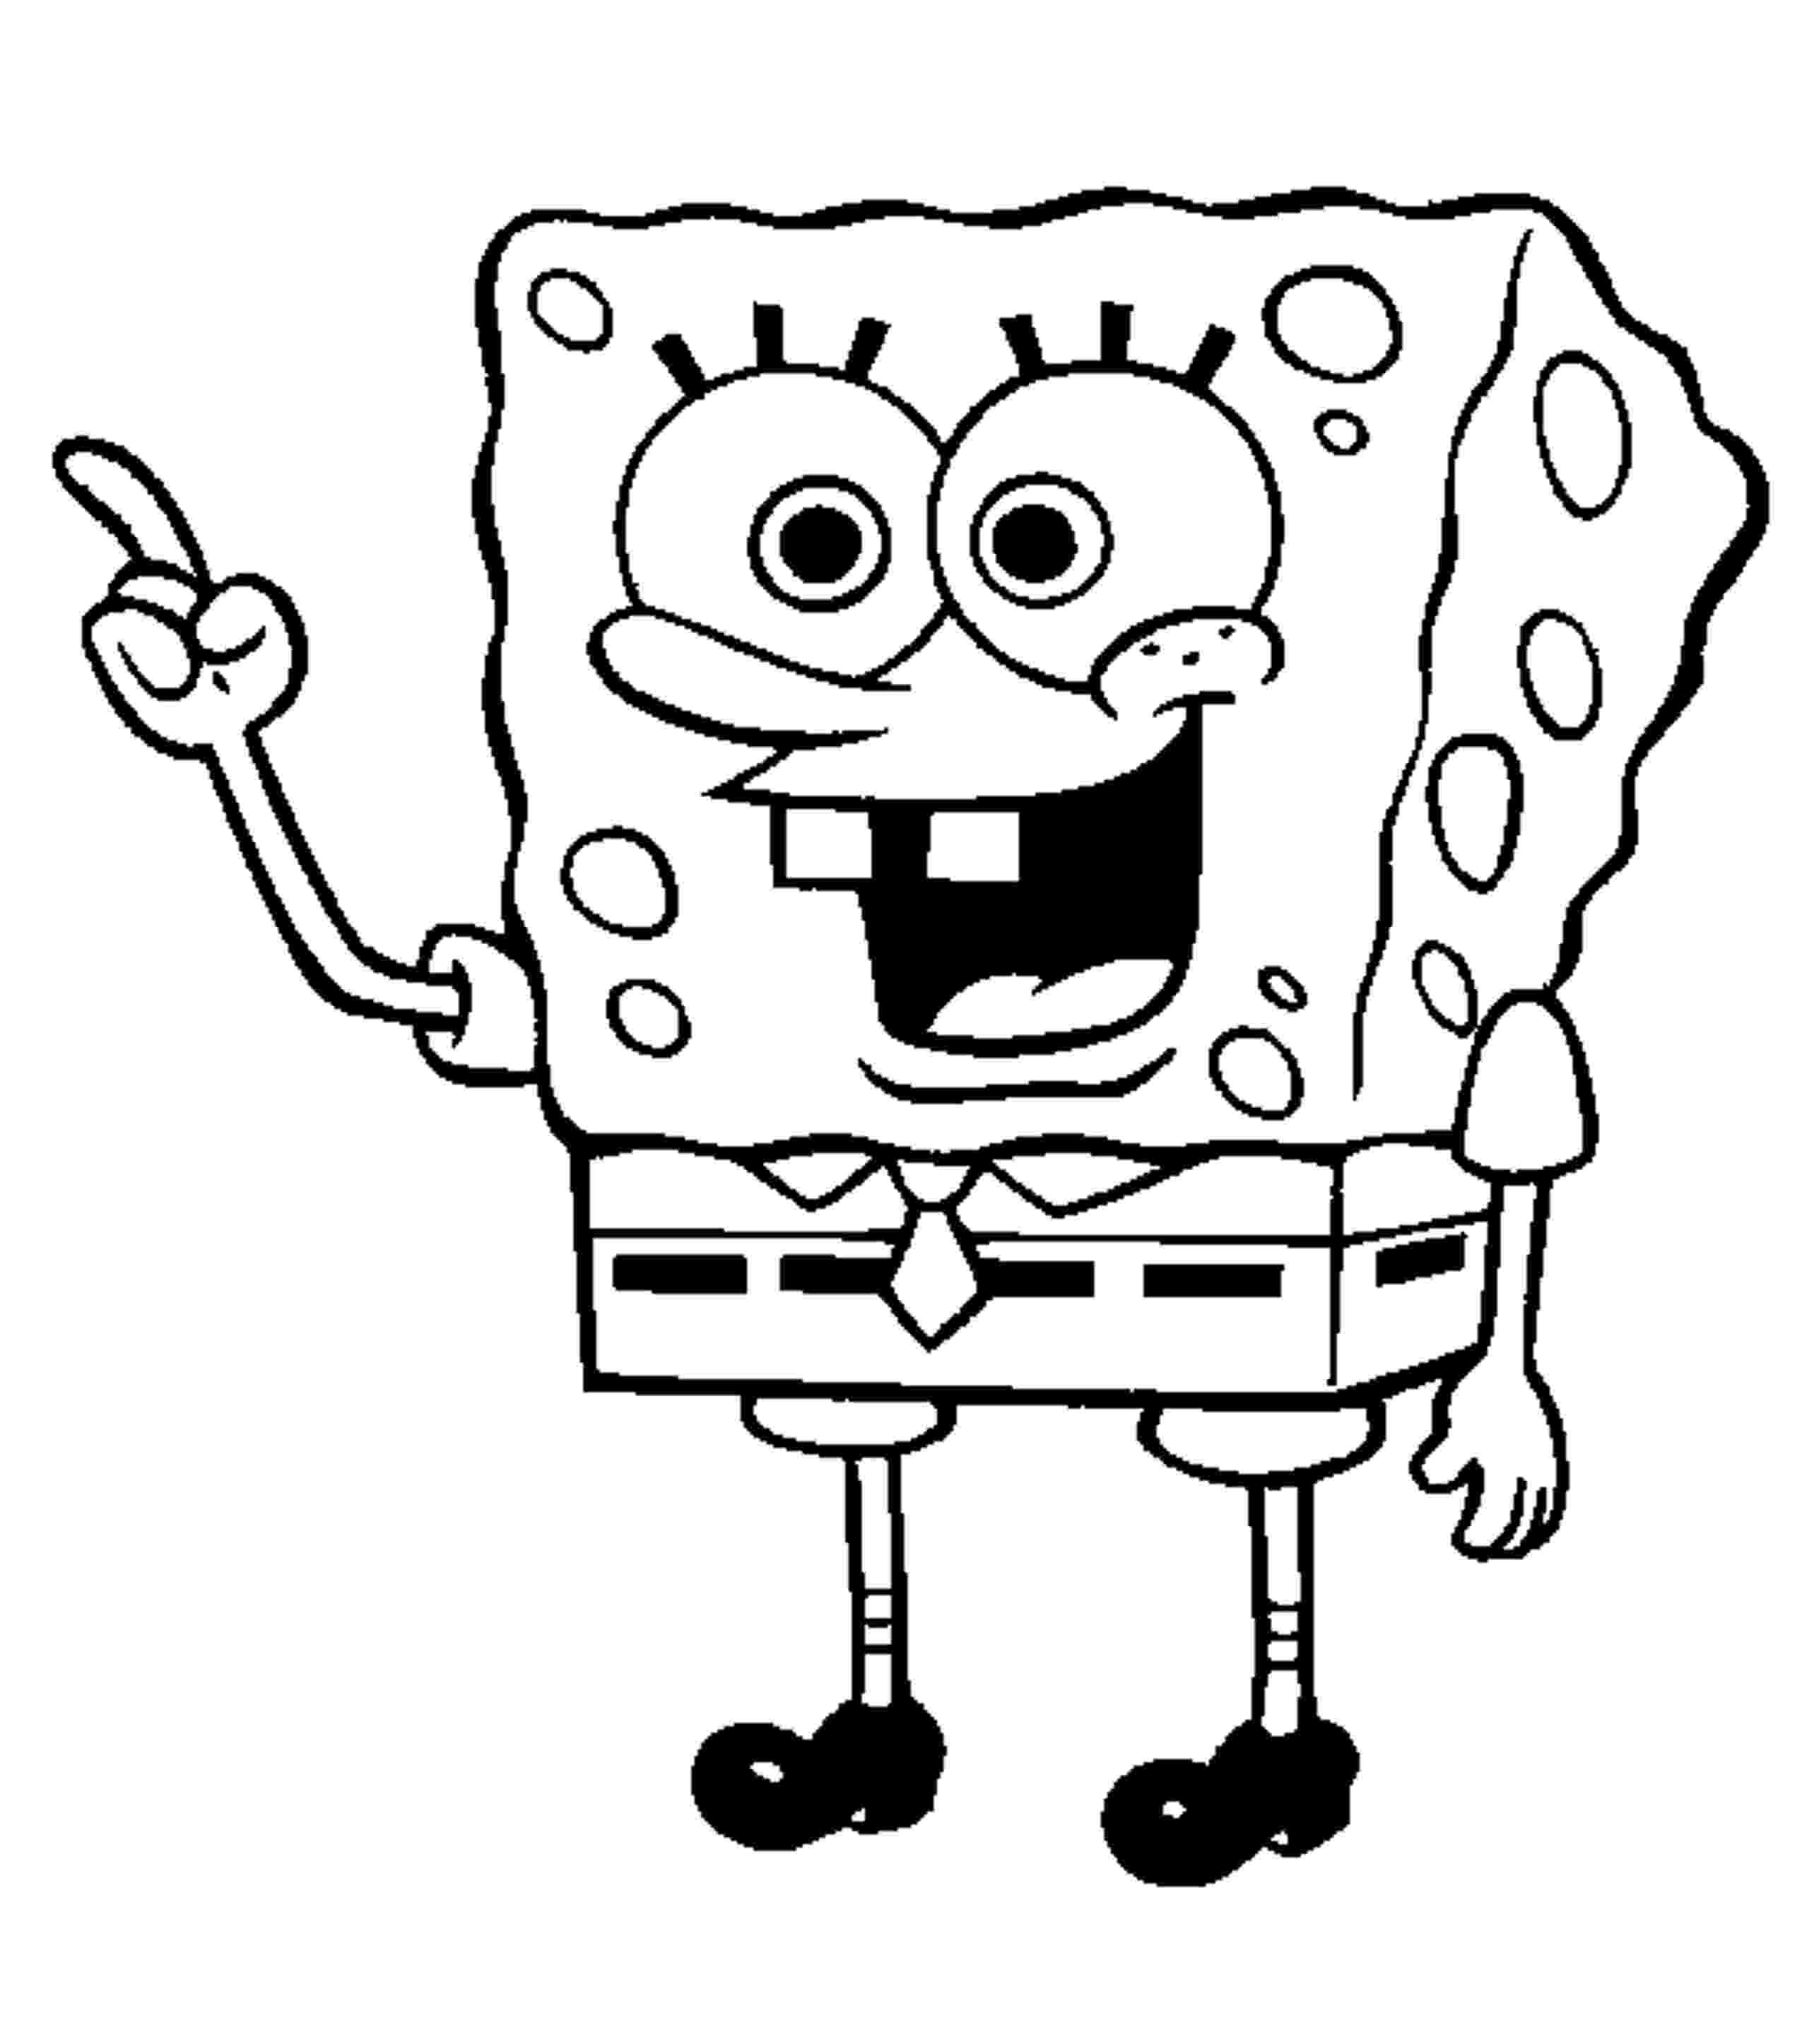 spongebob coloring book download spongebob coloring pages free for kids book download spongebob coloring